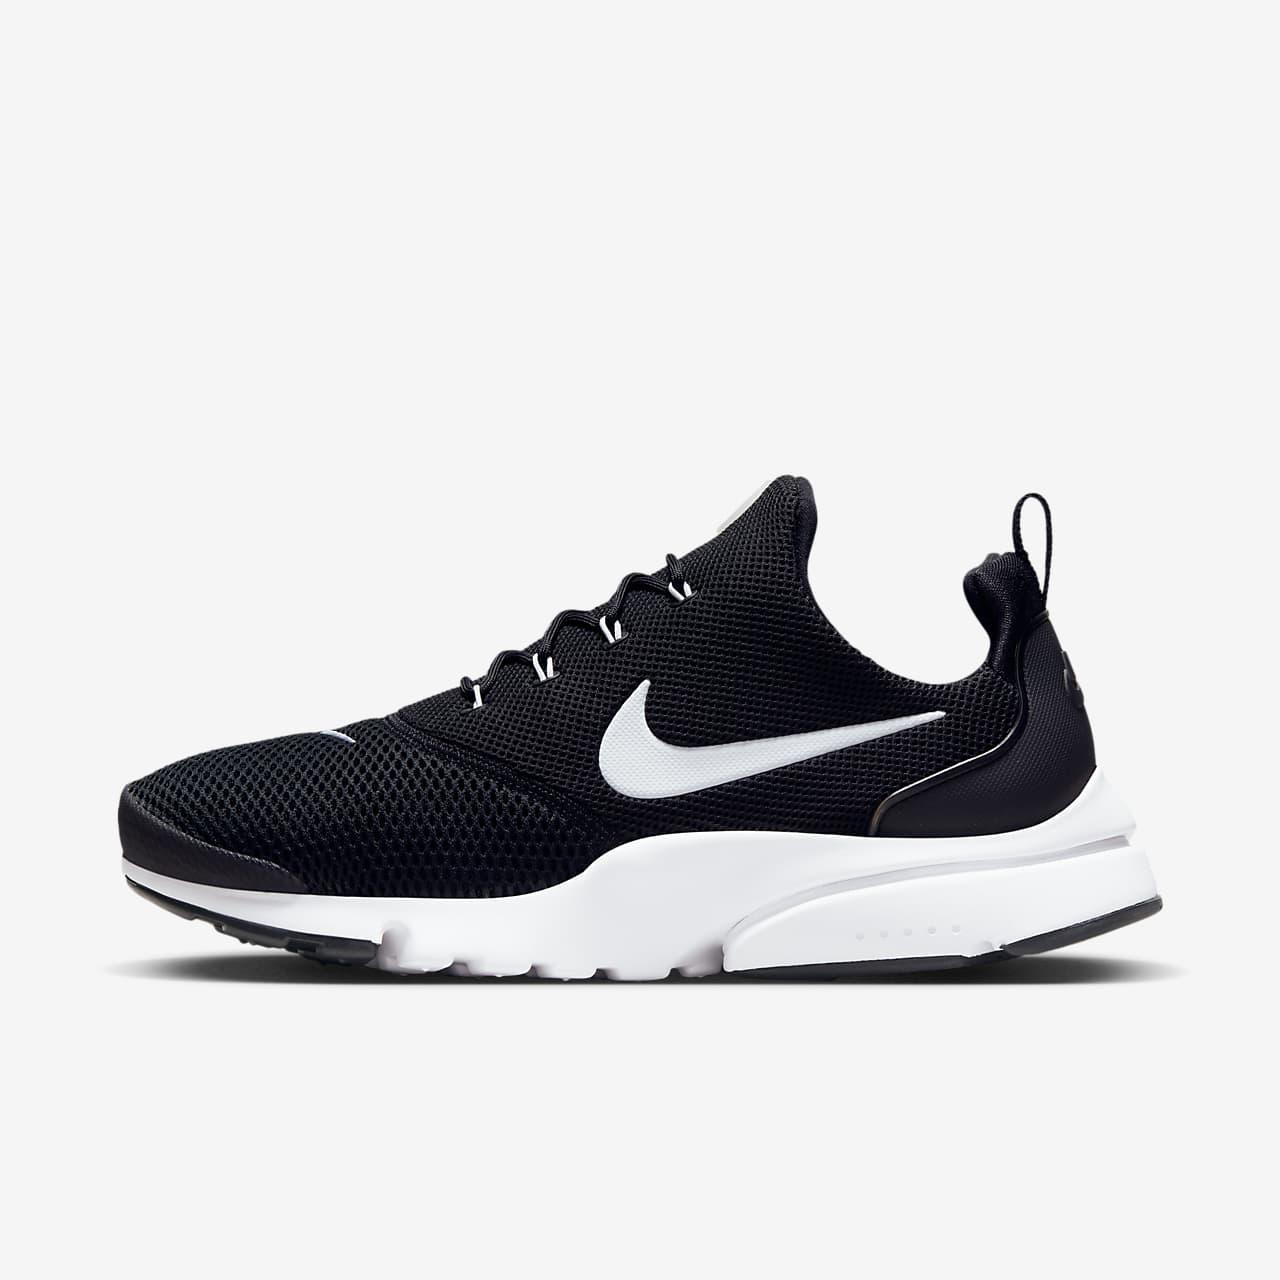 cheap for discount 99da1 566ae ... Nike Presto Fly Mens Shoe